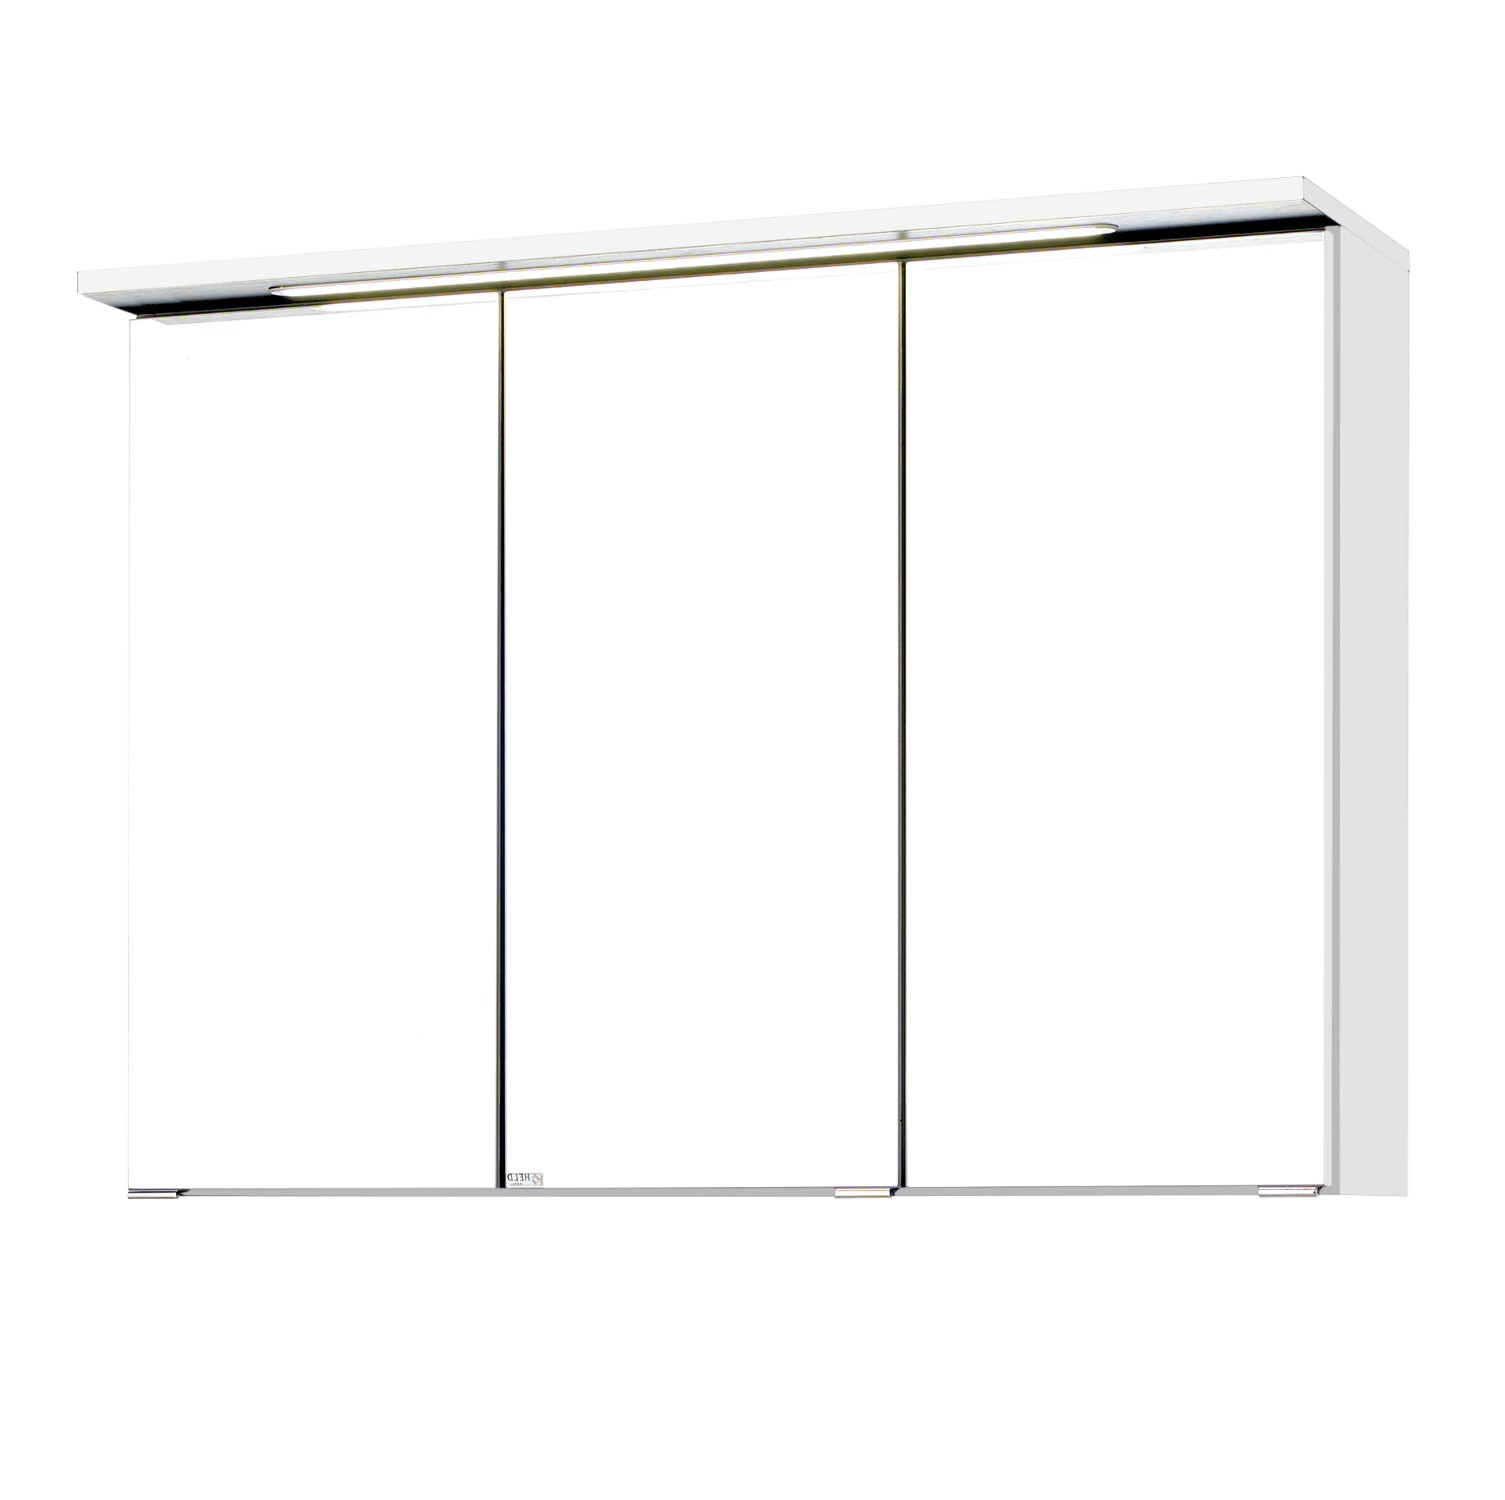 badezimmerspiegel bologna spiegelschrank 3d badspiegel led 90cm weiss ebay. Black Bedroom Furniture Sets. Home Design Ideas